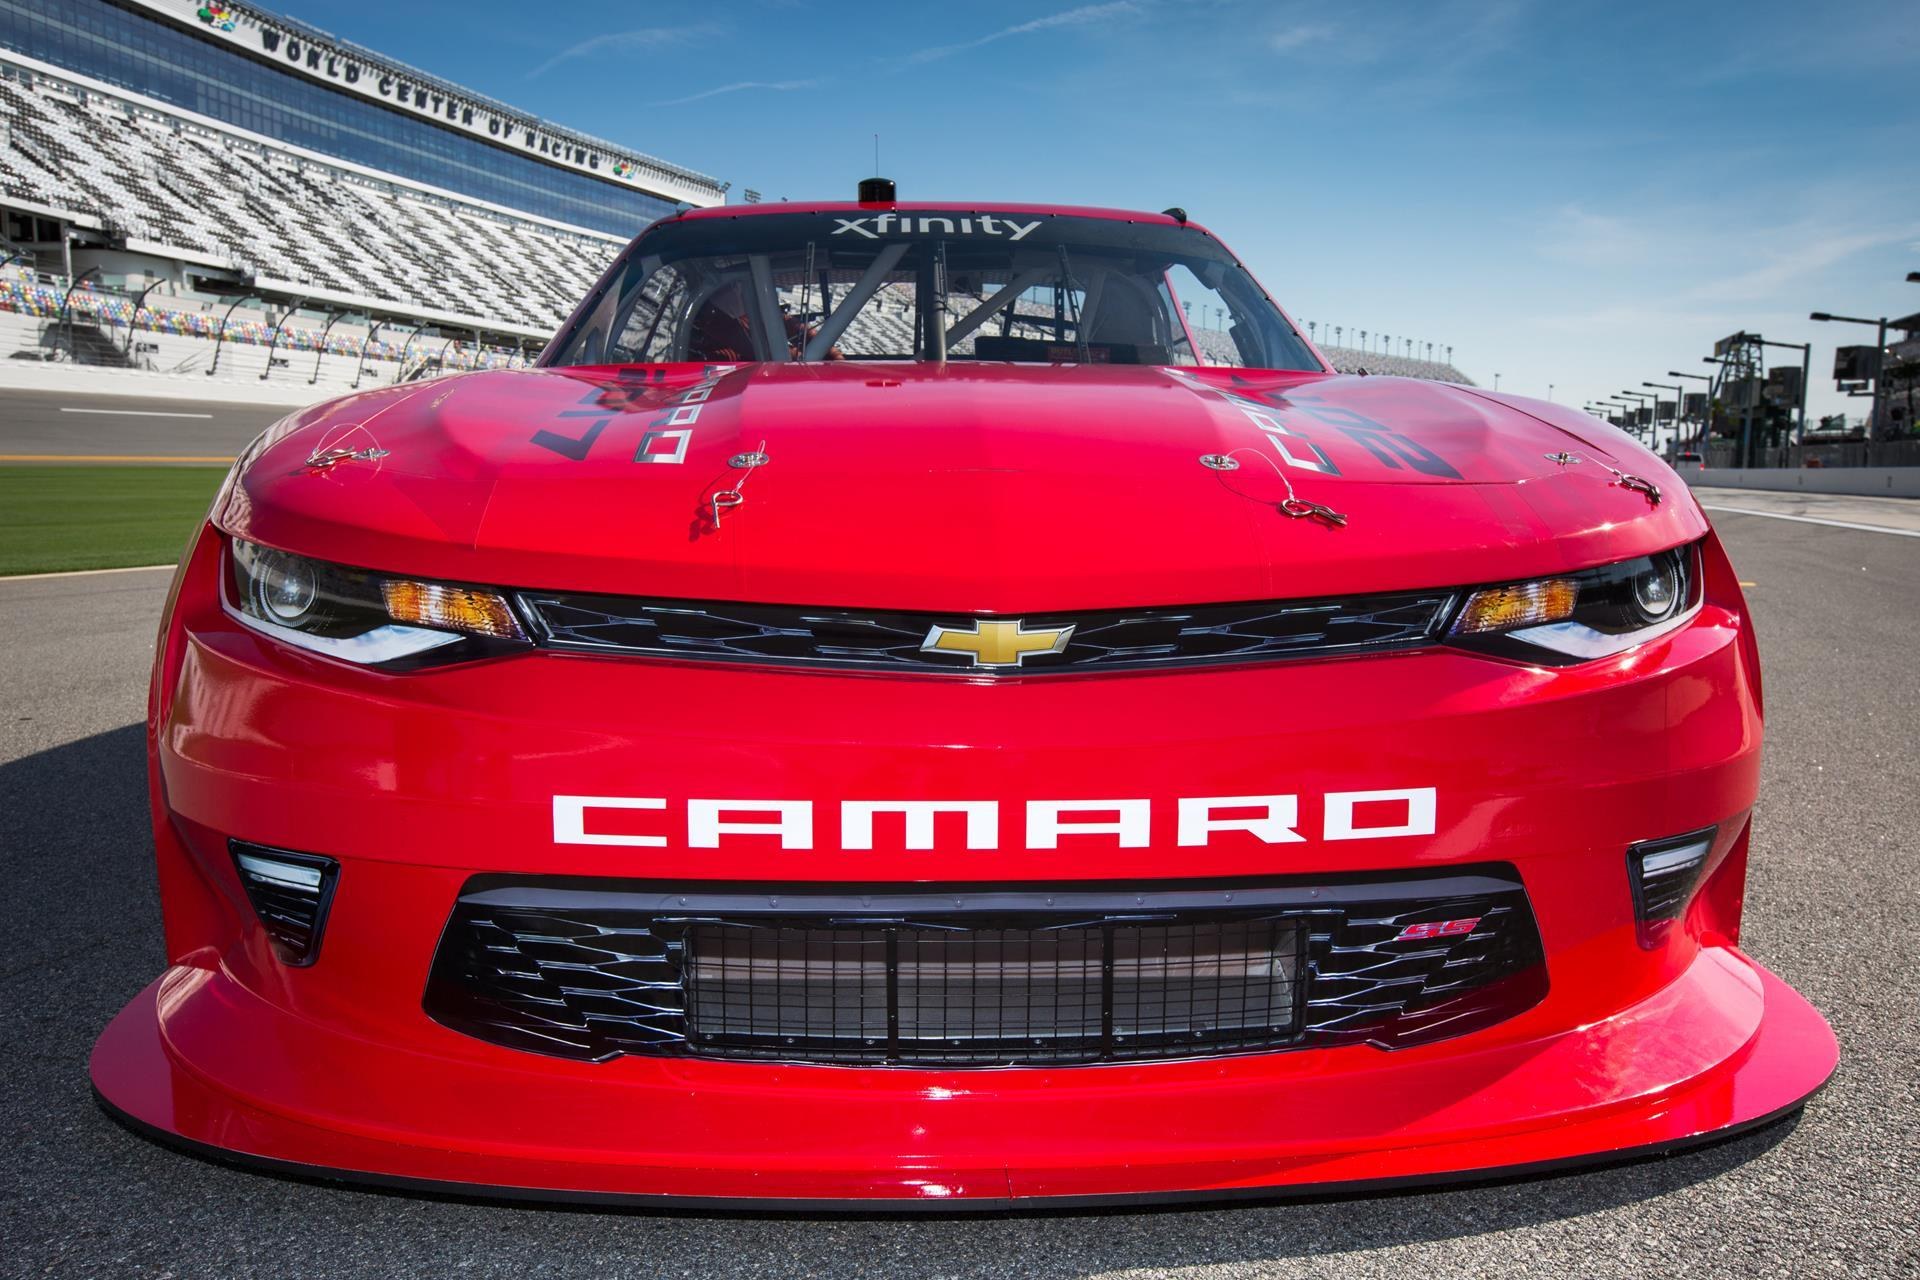 Chevrolet Camaro Ss To Race In 2017 Nascar Xfinity Series | 2017 ...